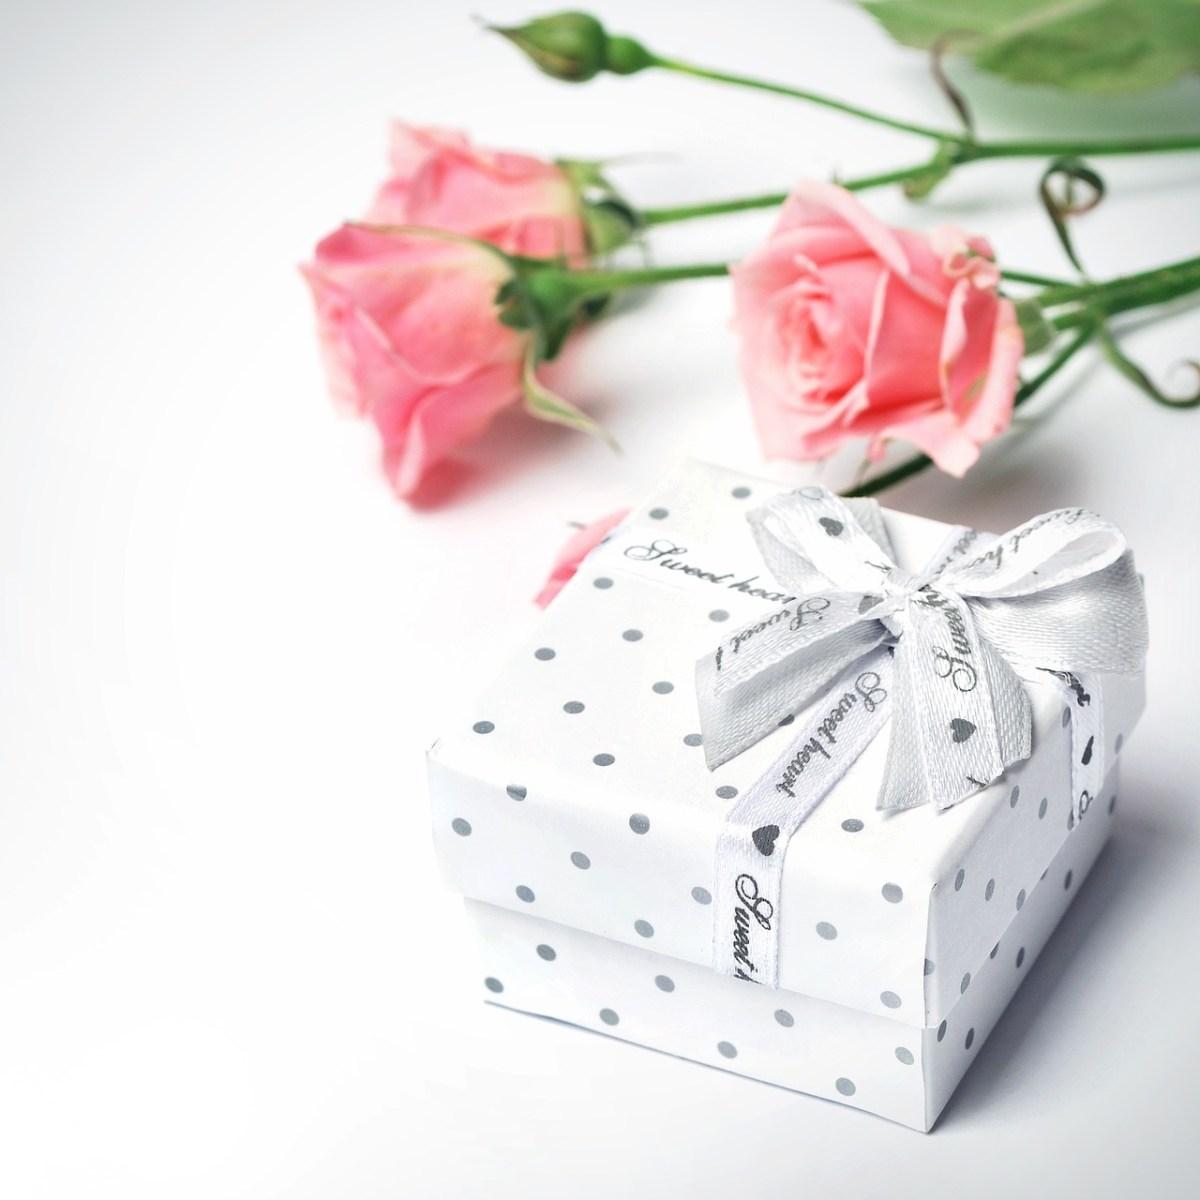 Quel cadeau de naissance offrir en 2019 ?